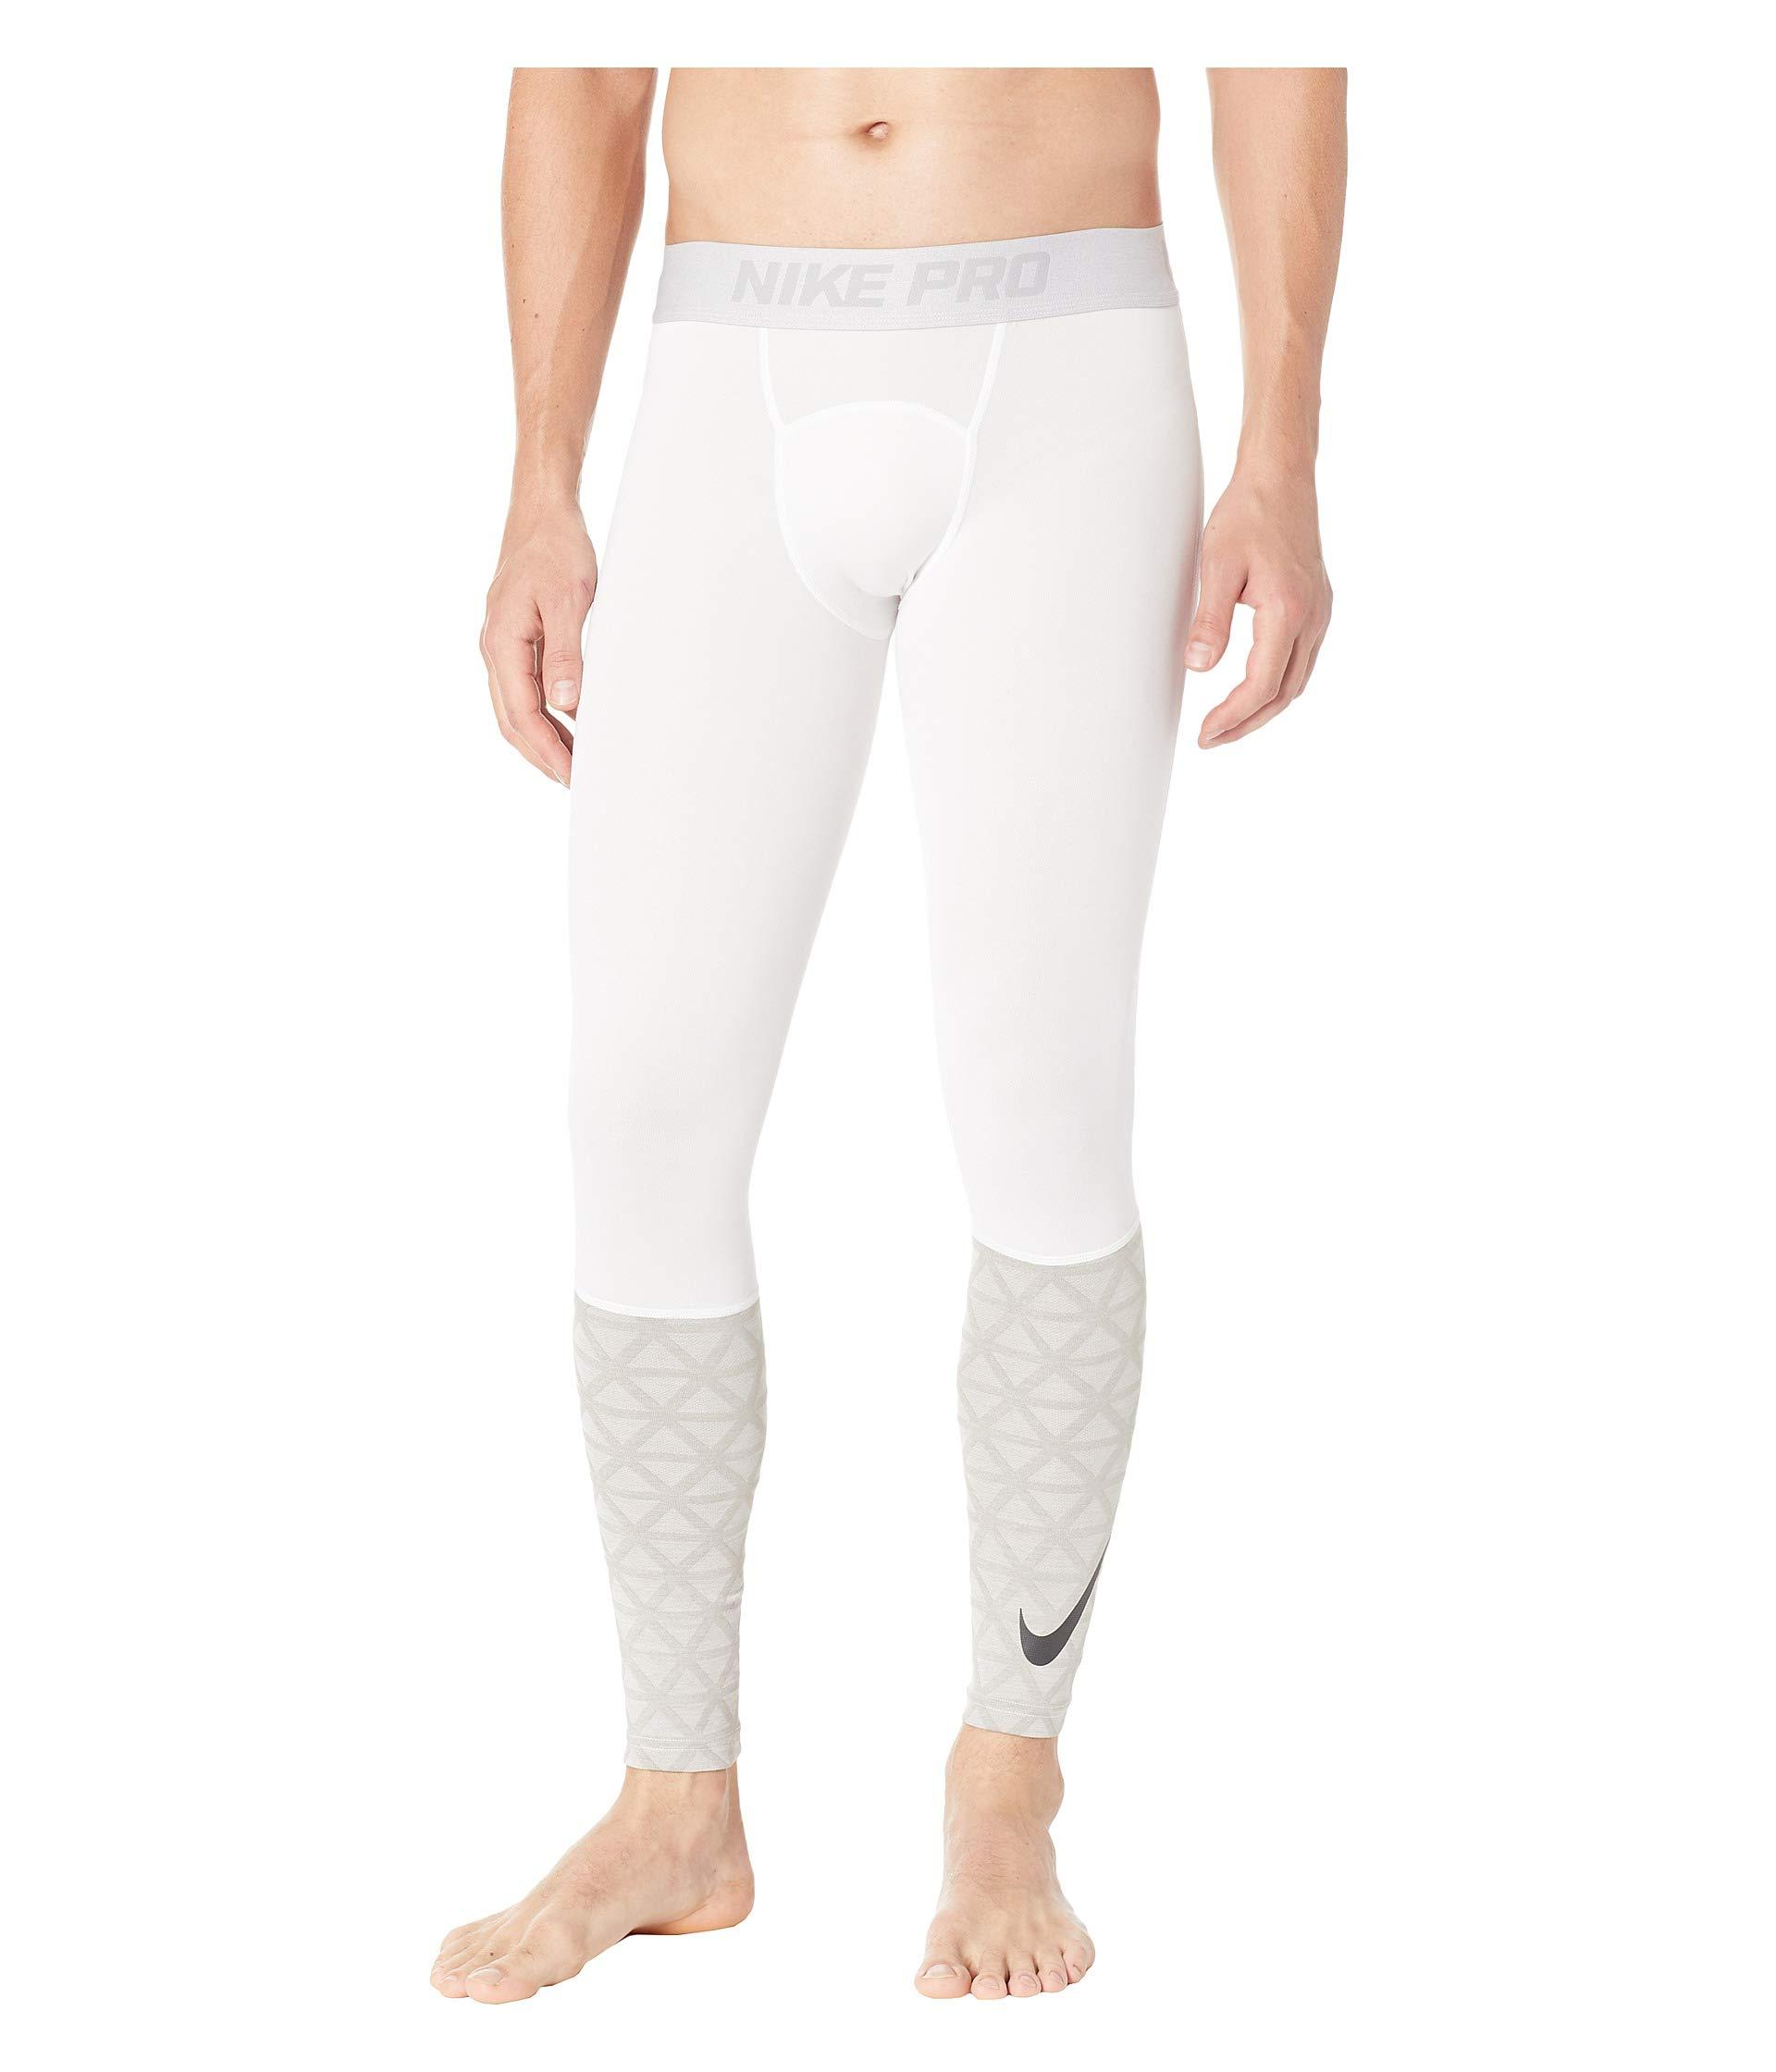 Nike Men's Pro Tight Training Pants (Small, White/Cool Grey)